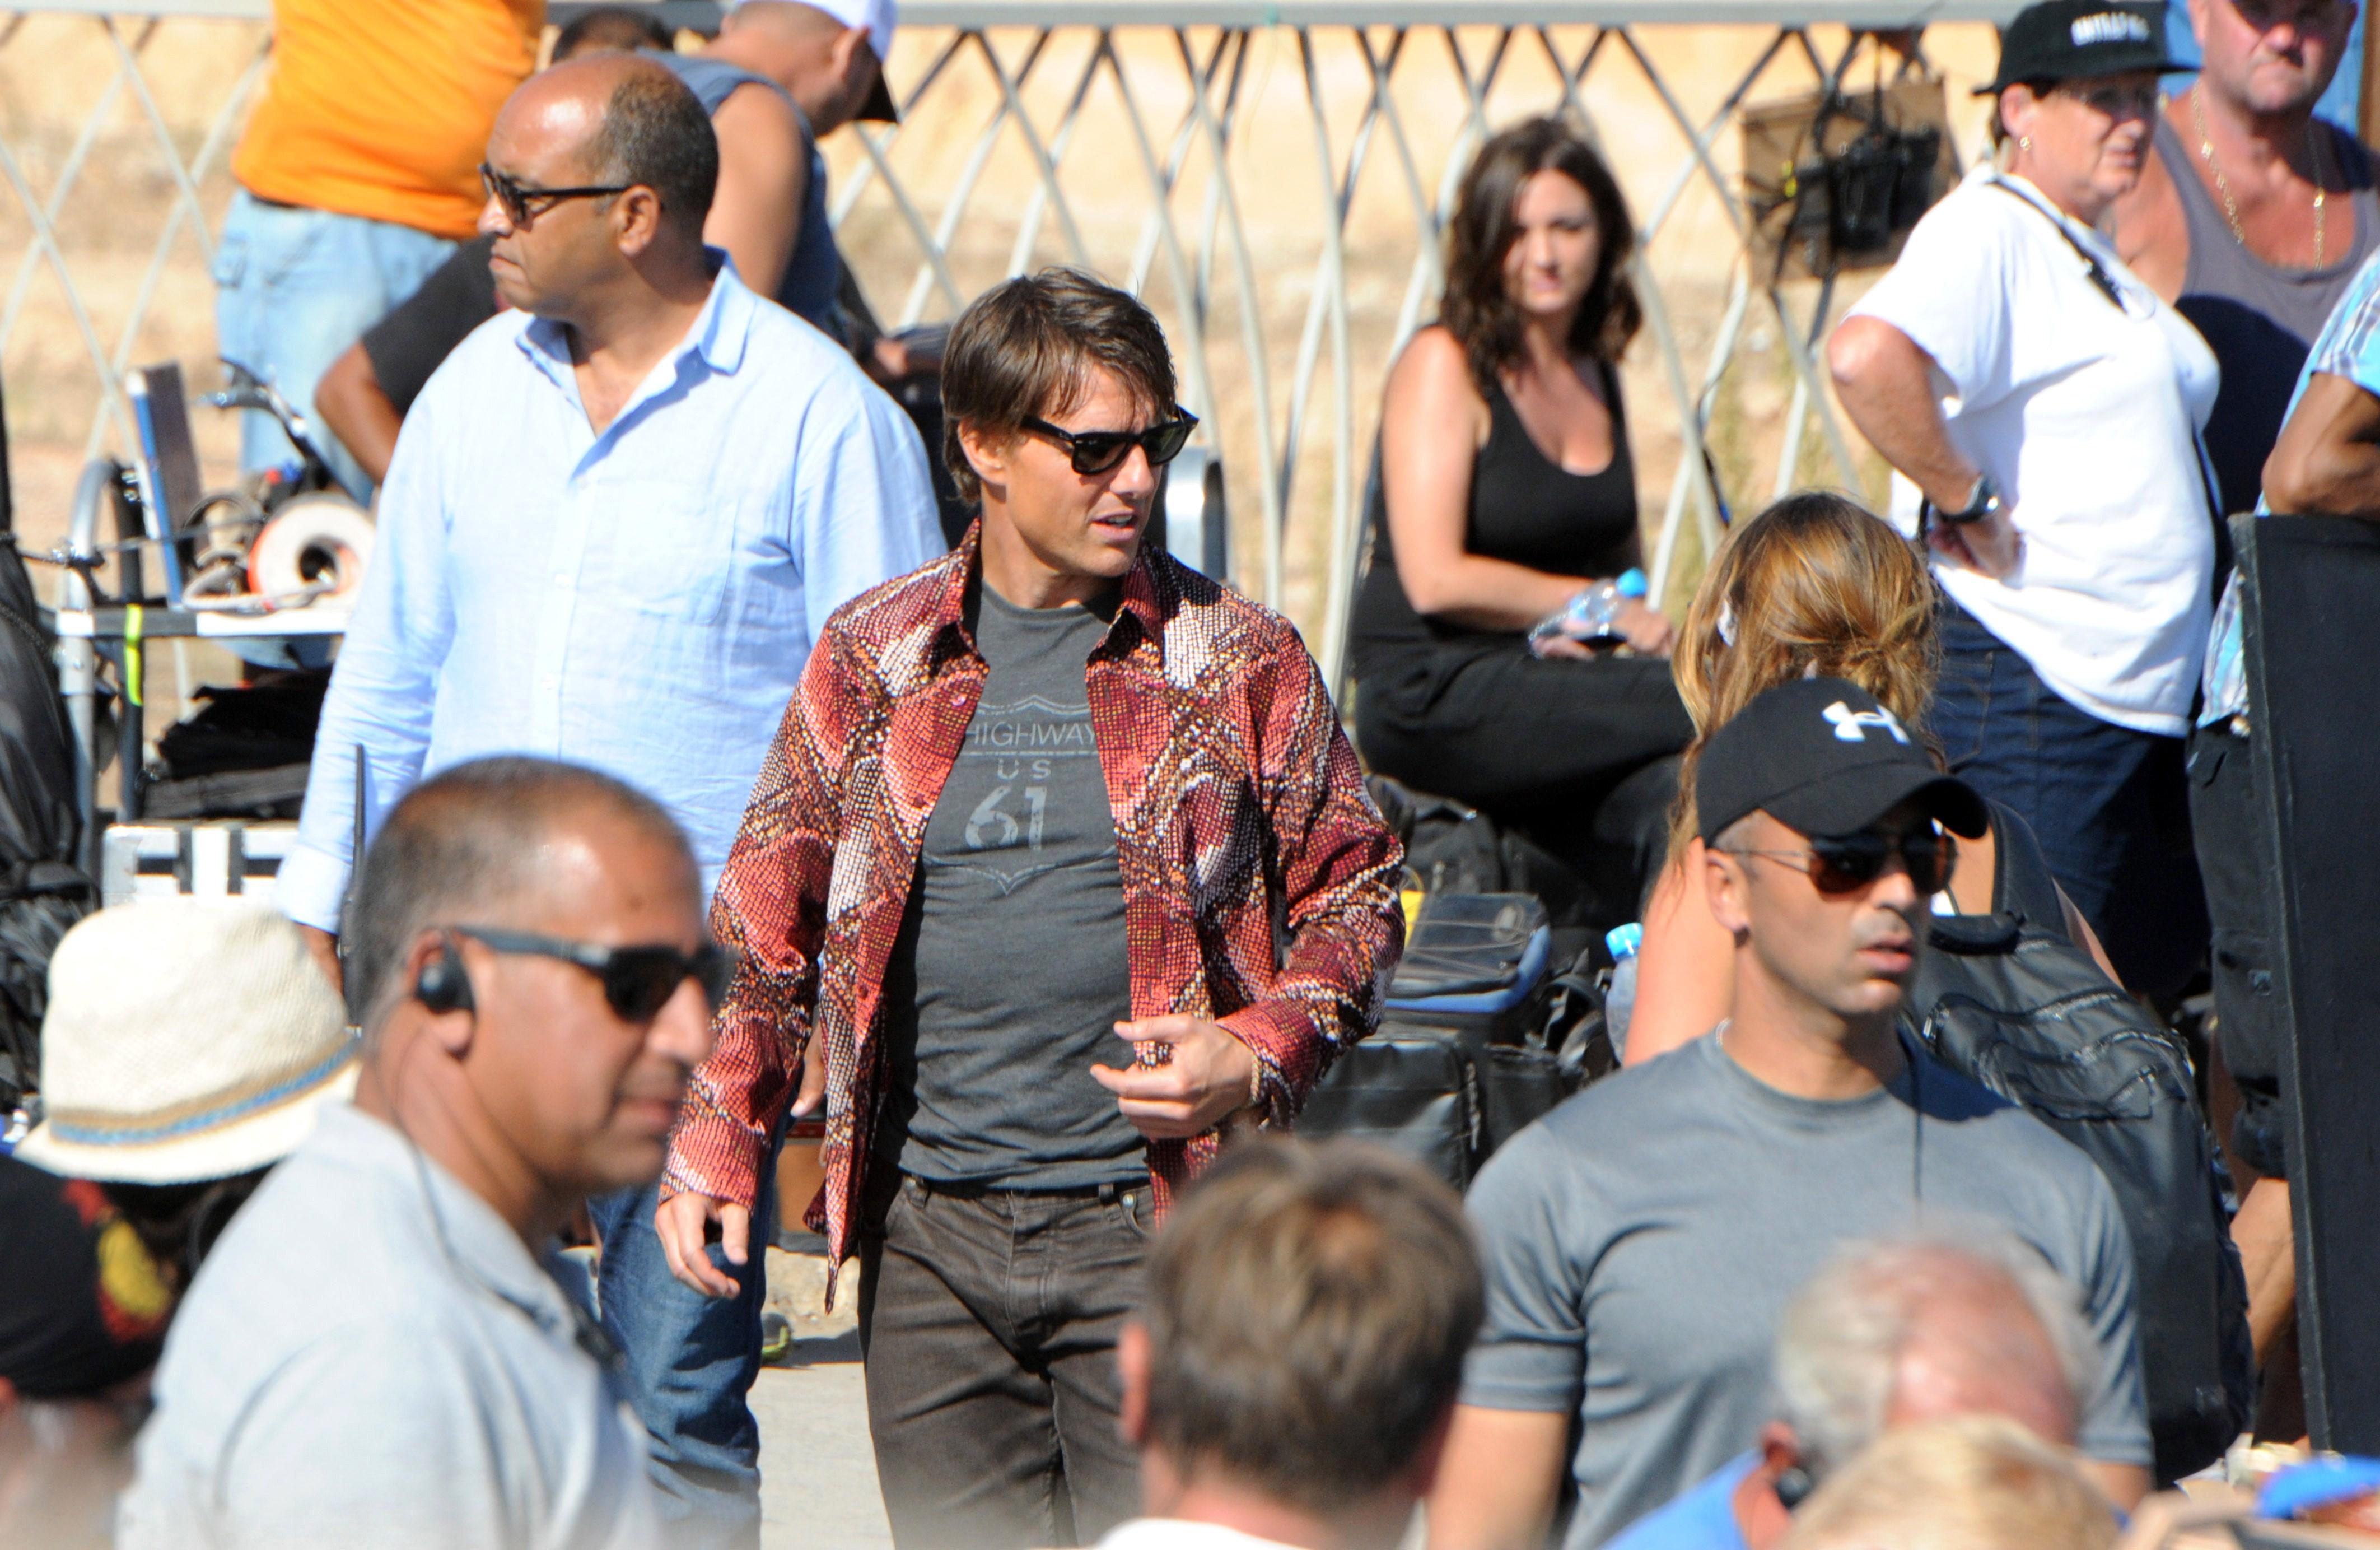 Tom Cruise dating Lohan